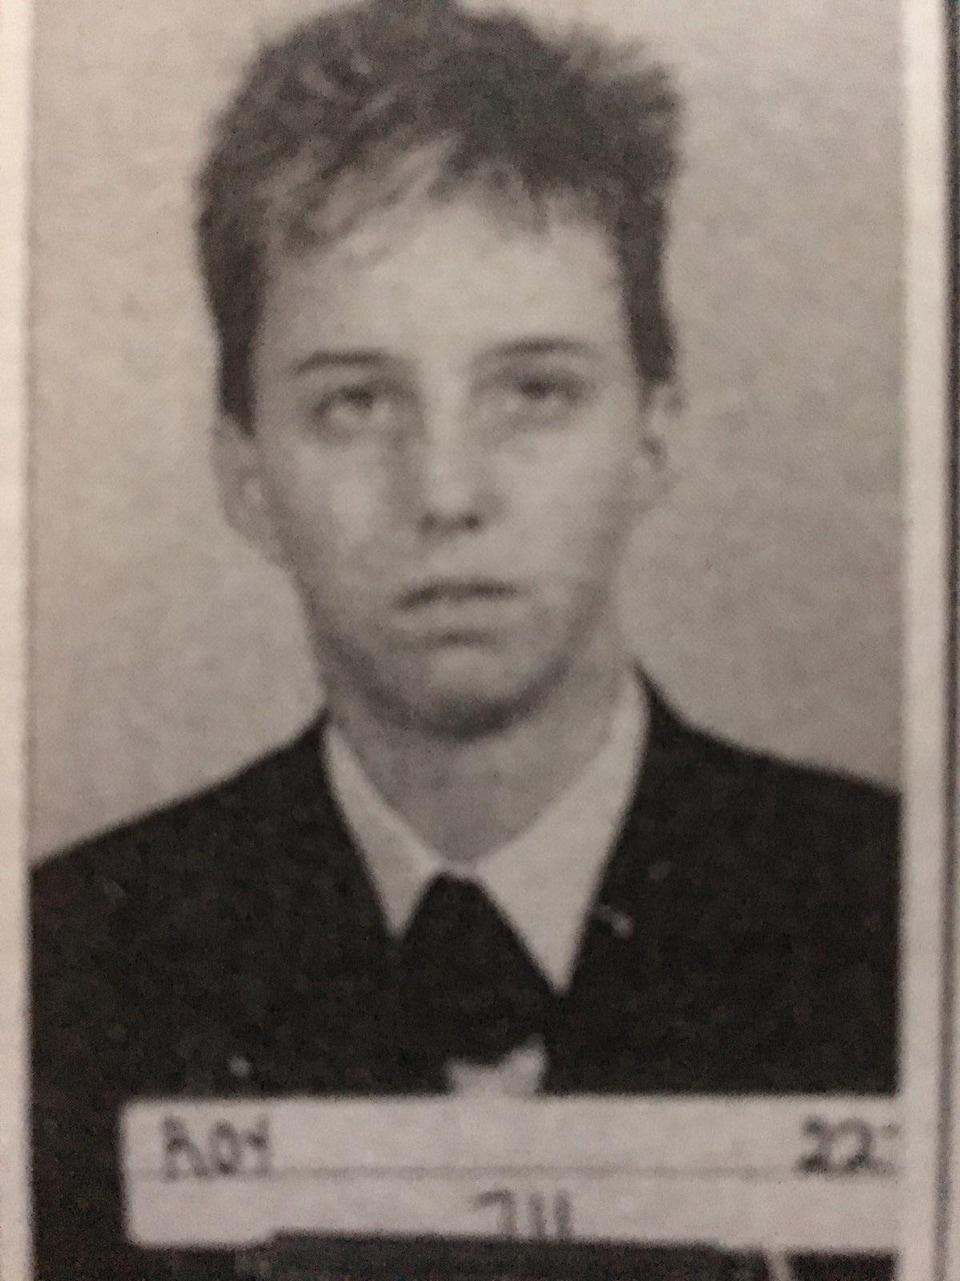 Martine Roy à 19 ans.